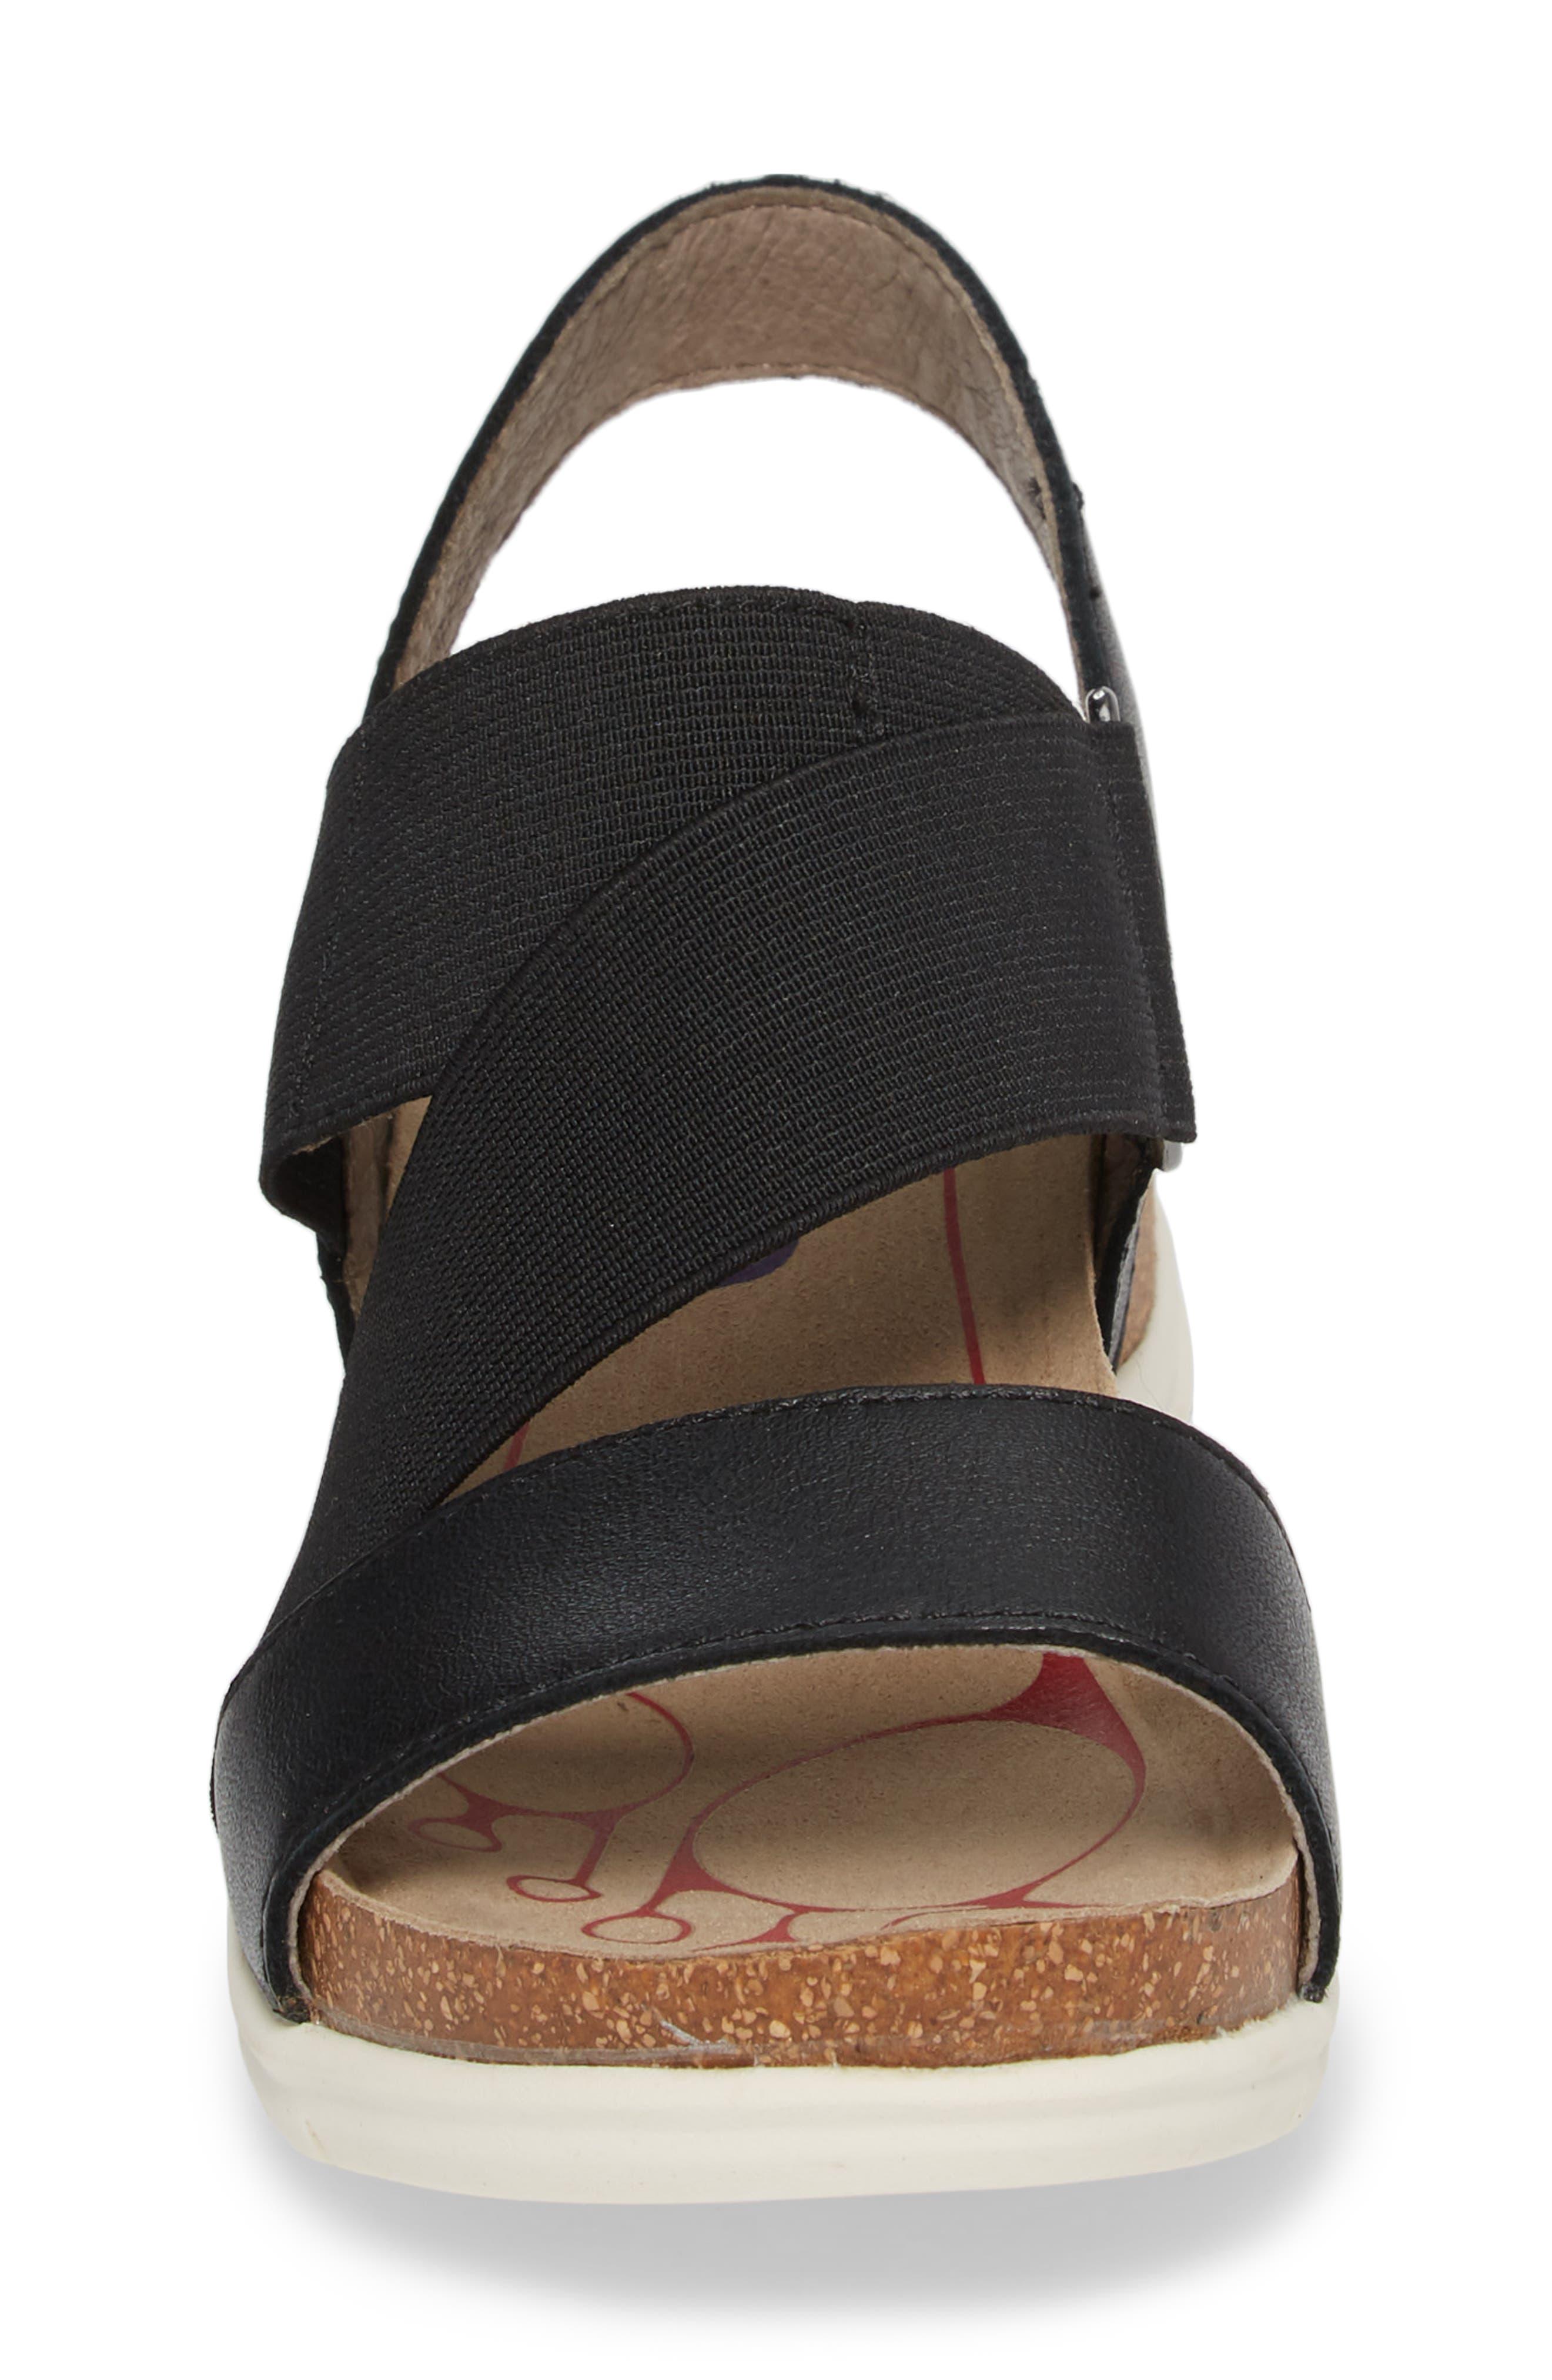 Paisley Wedge Sandal,                             Alternate thumbnail 13, color,